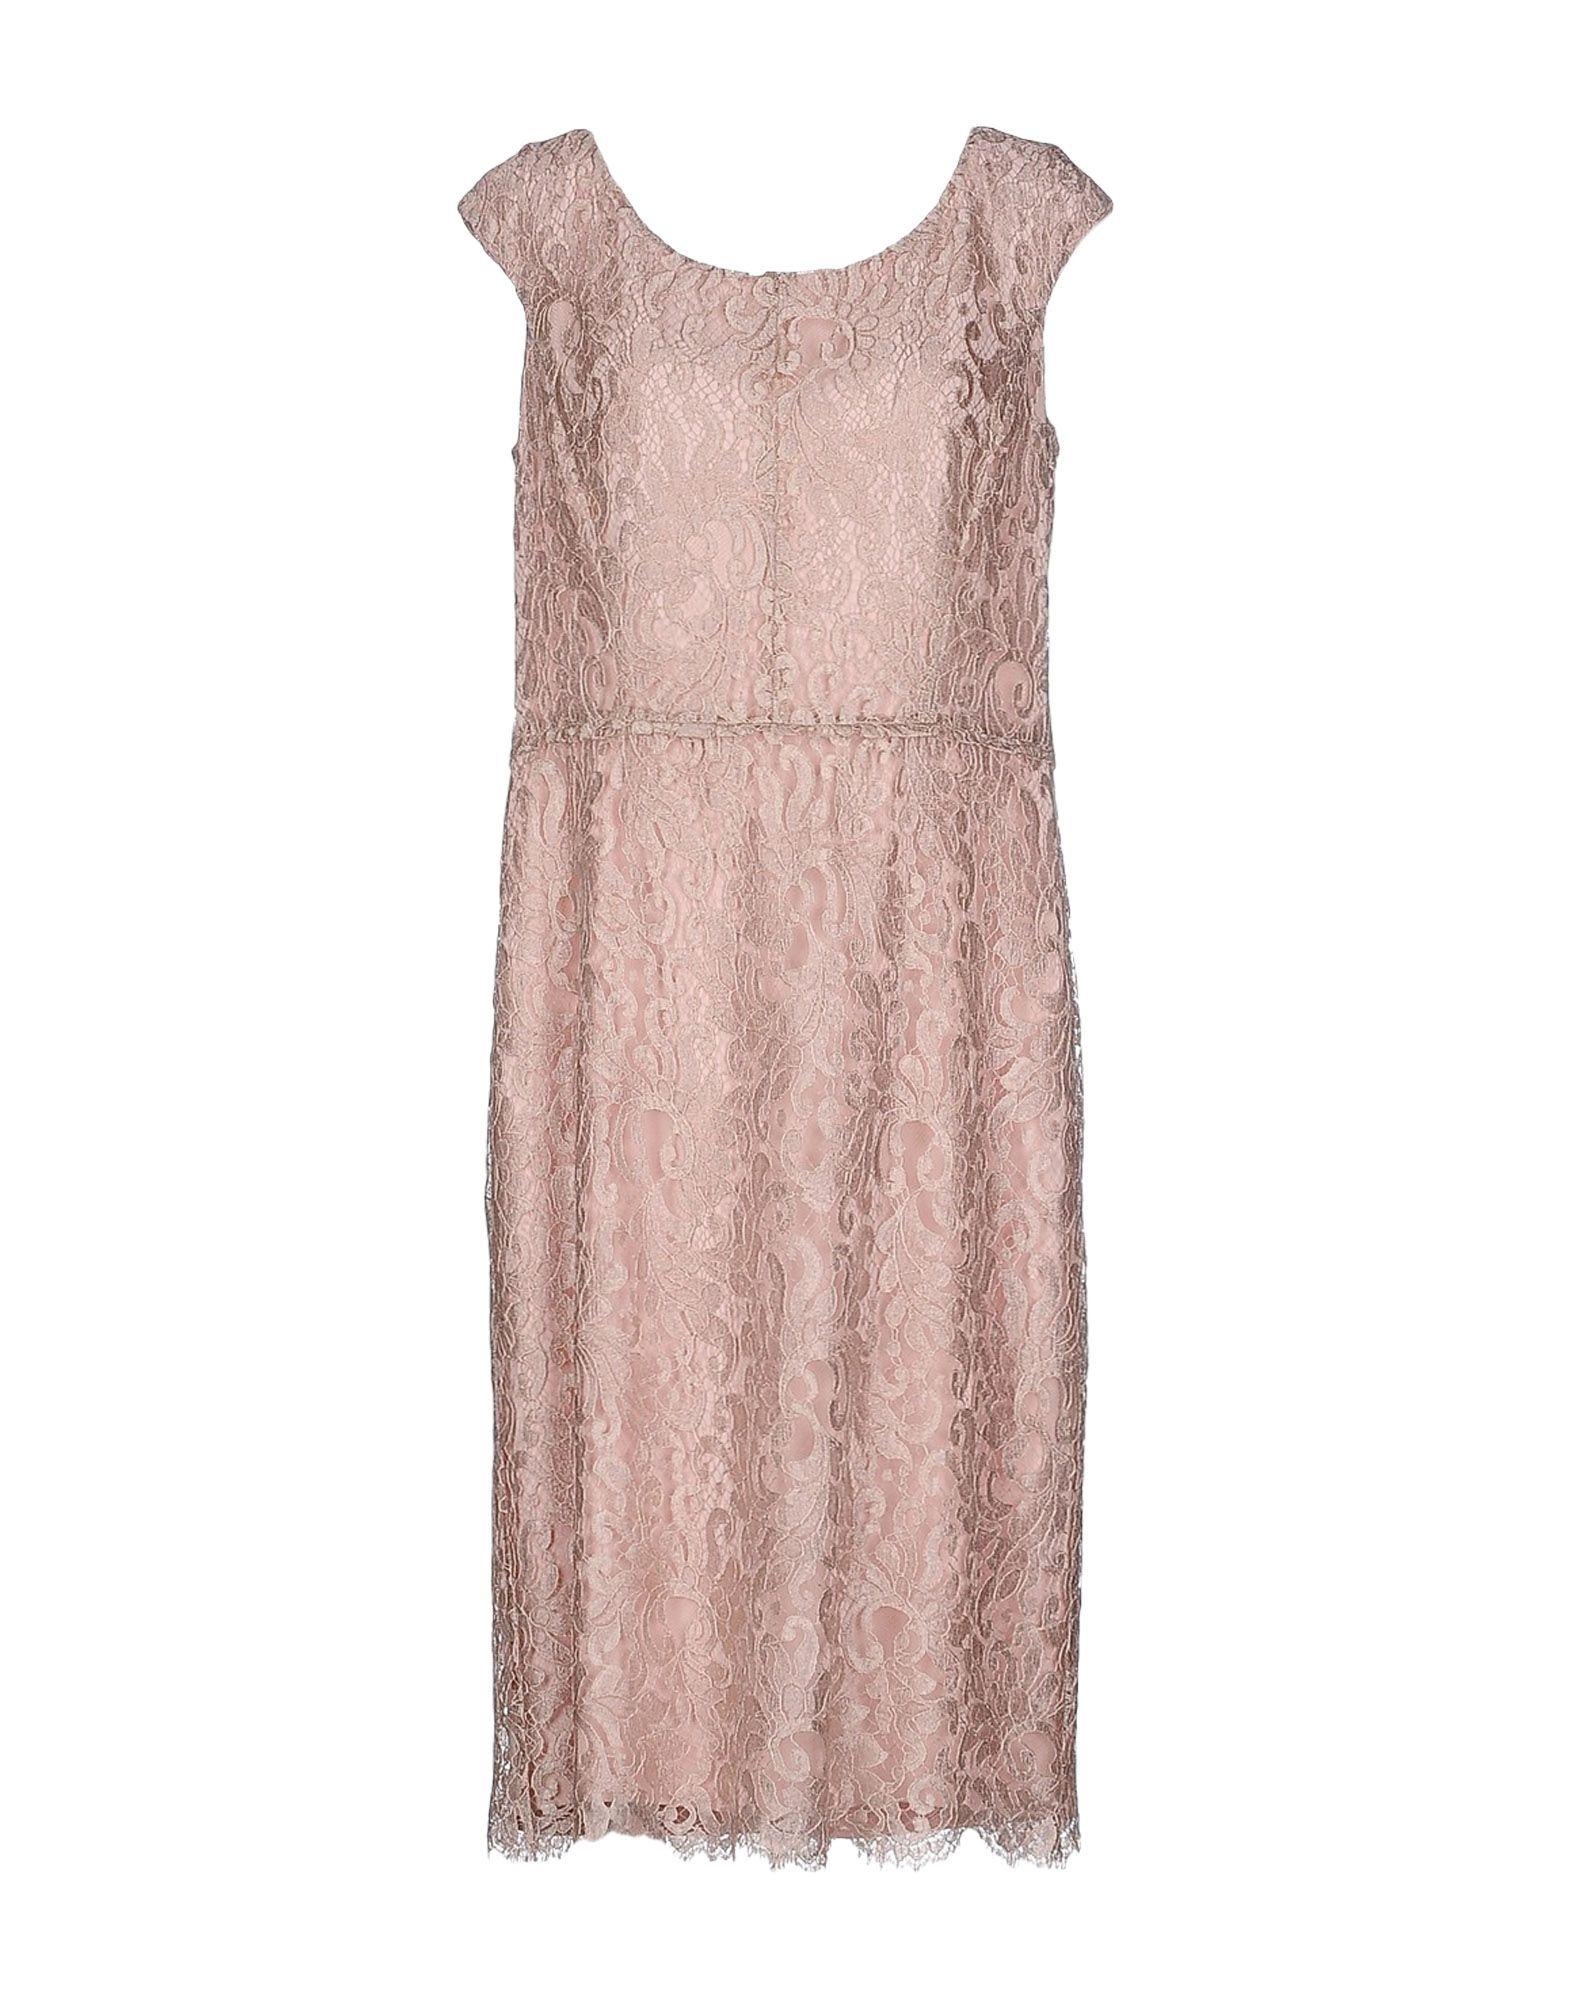 BOTONDI MILANO Платье до колена платье xs milano платье